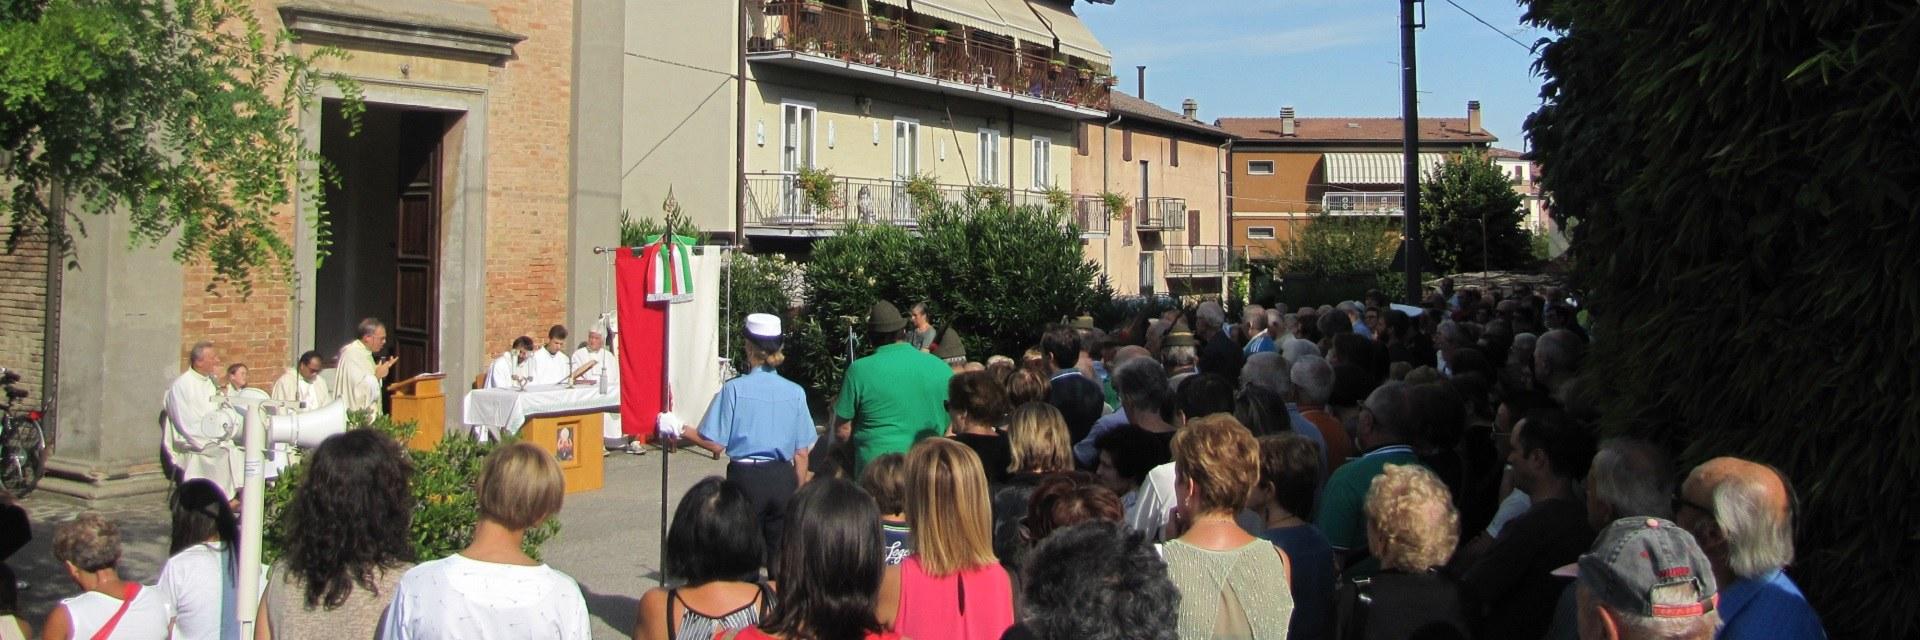 San Rocco fair